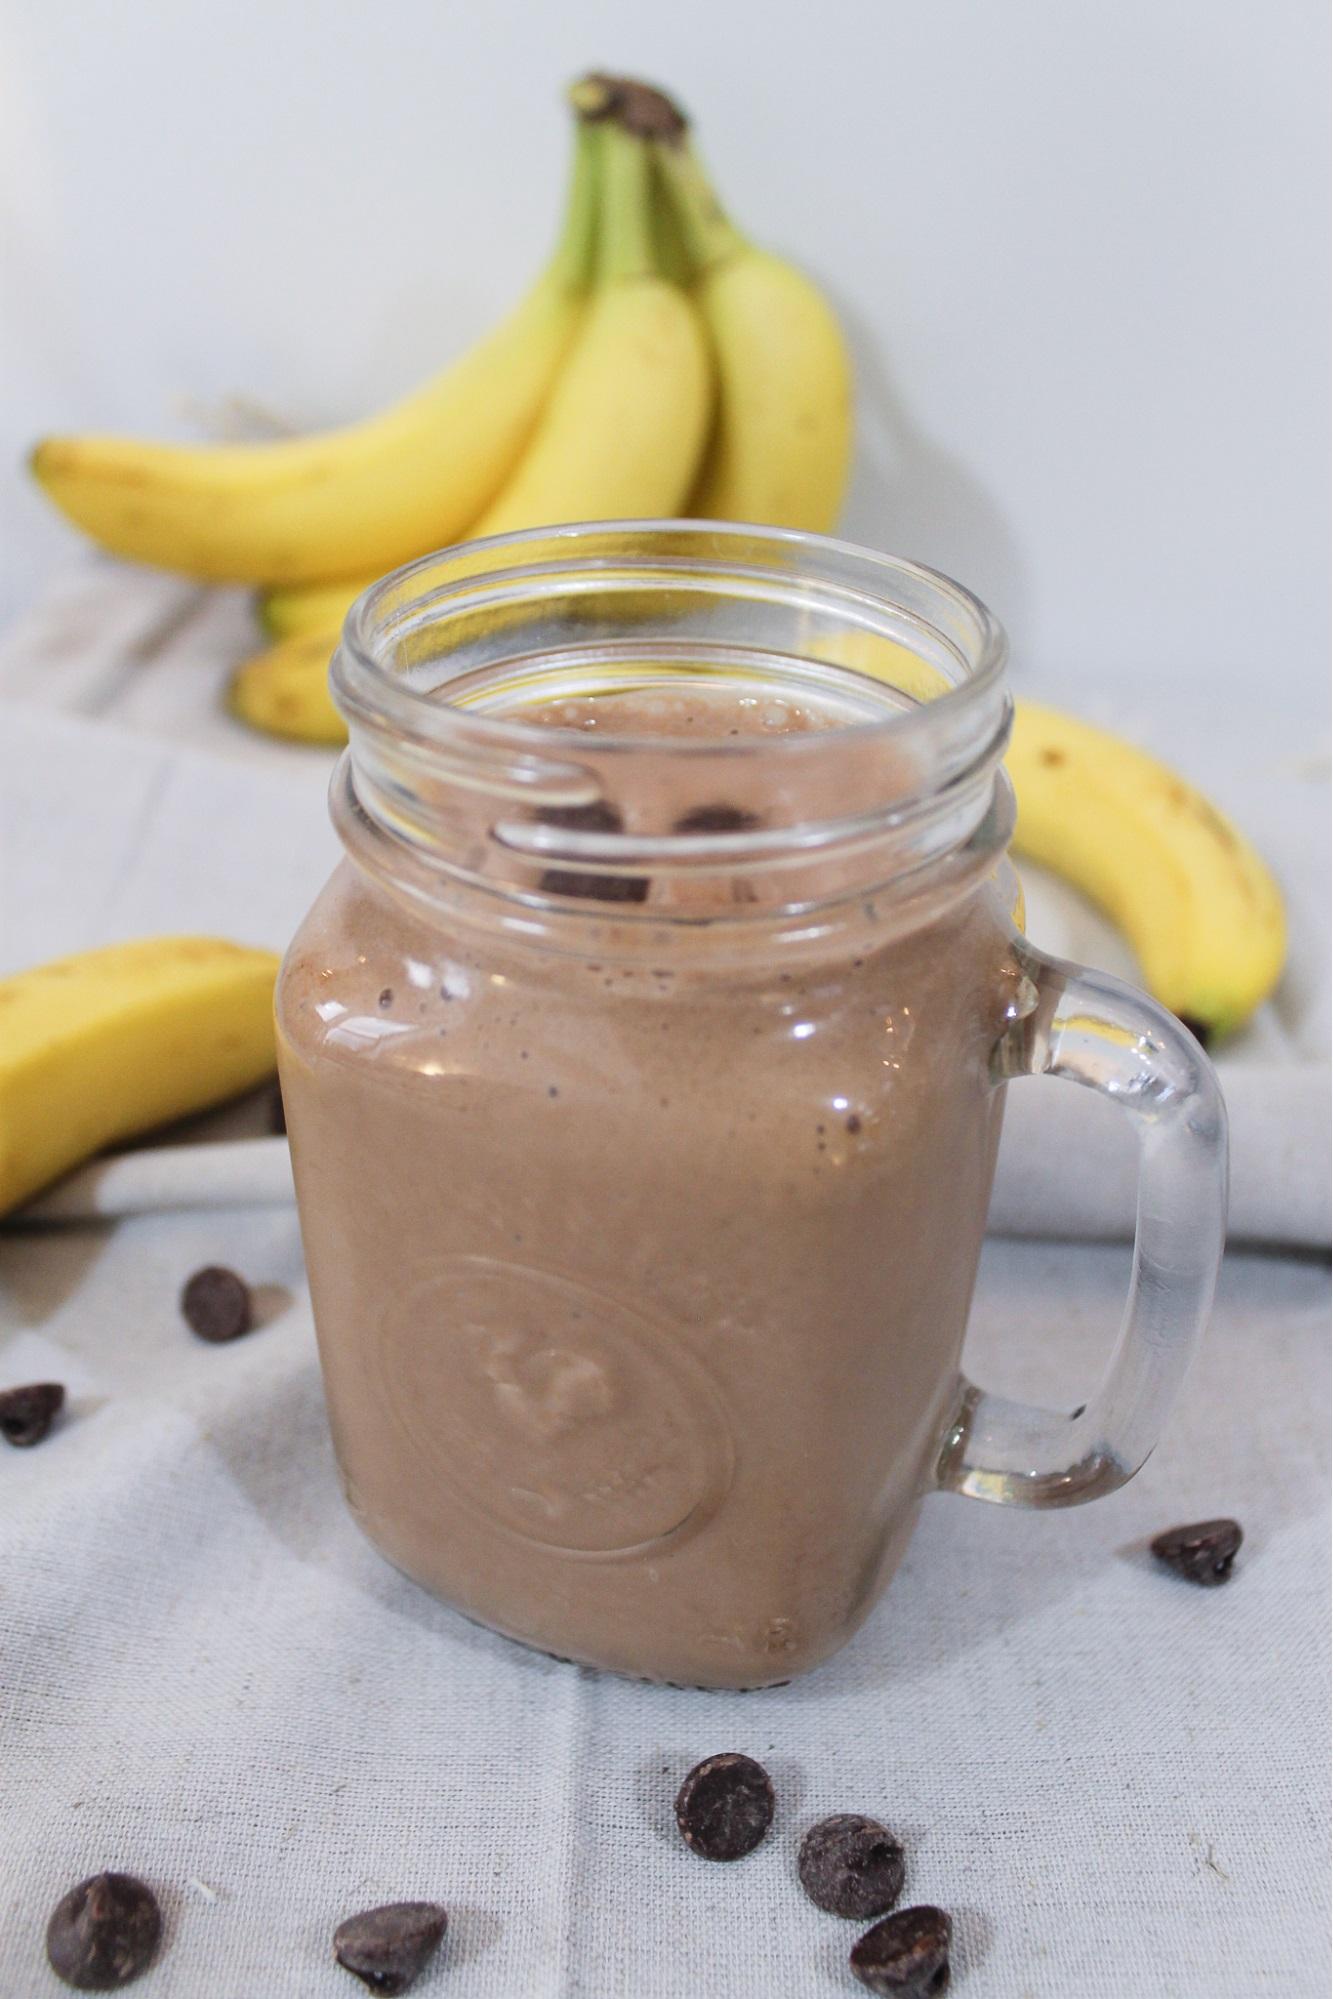 chocolate 3-ingredient smoothie recipes